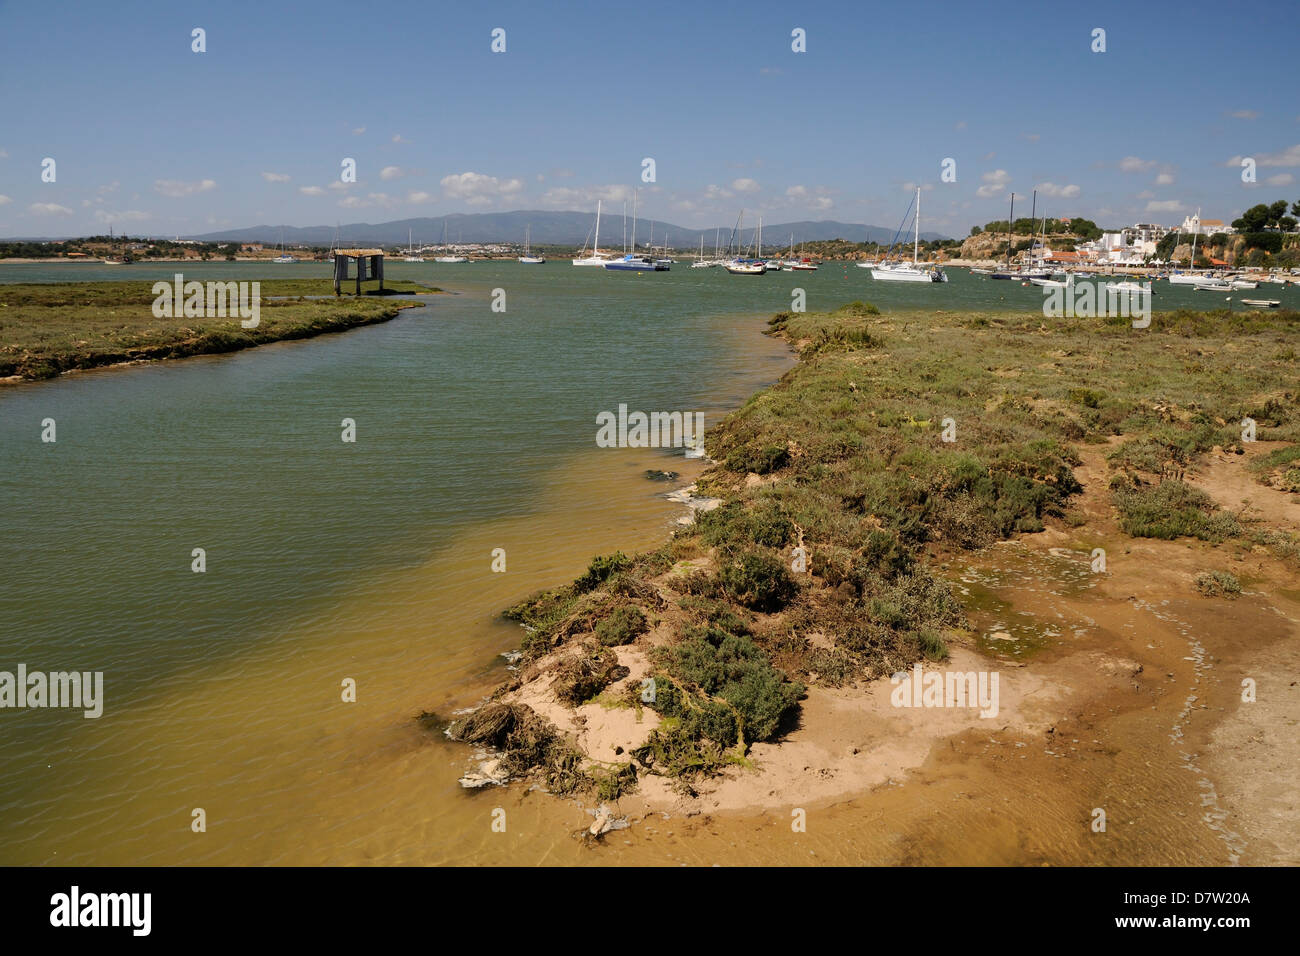 Saltmarsh, estuarine harbour at high tide and moored sailing yachts, Alvor, near Portimao, Algarve, Portugal - Stock Image